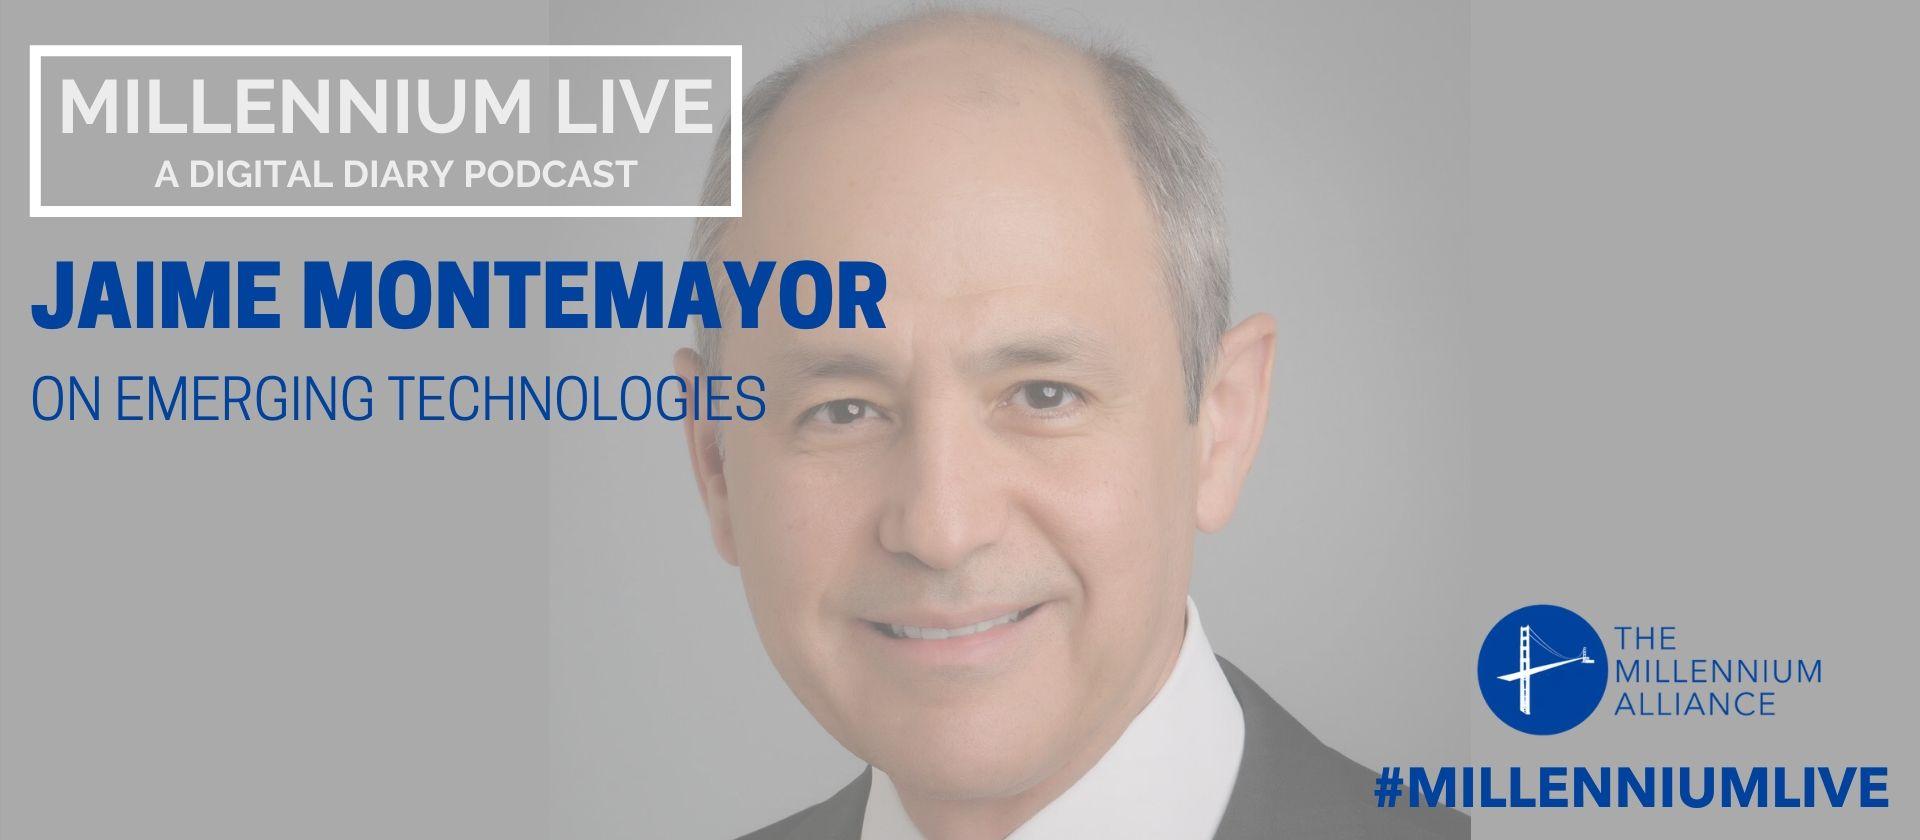 Jaime Montemayor Emerging Technologies Podcast